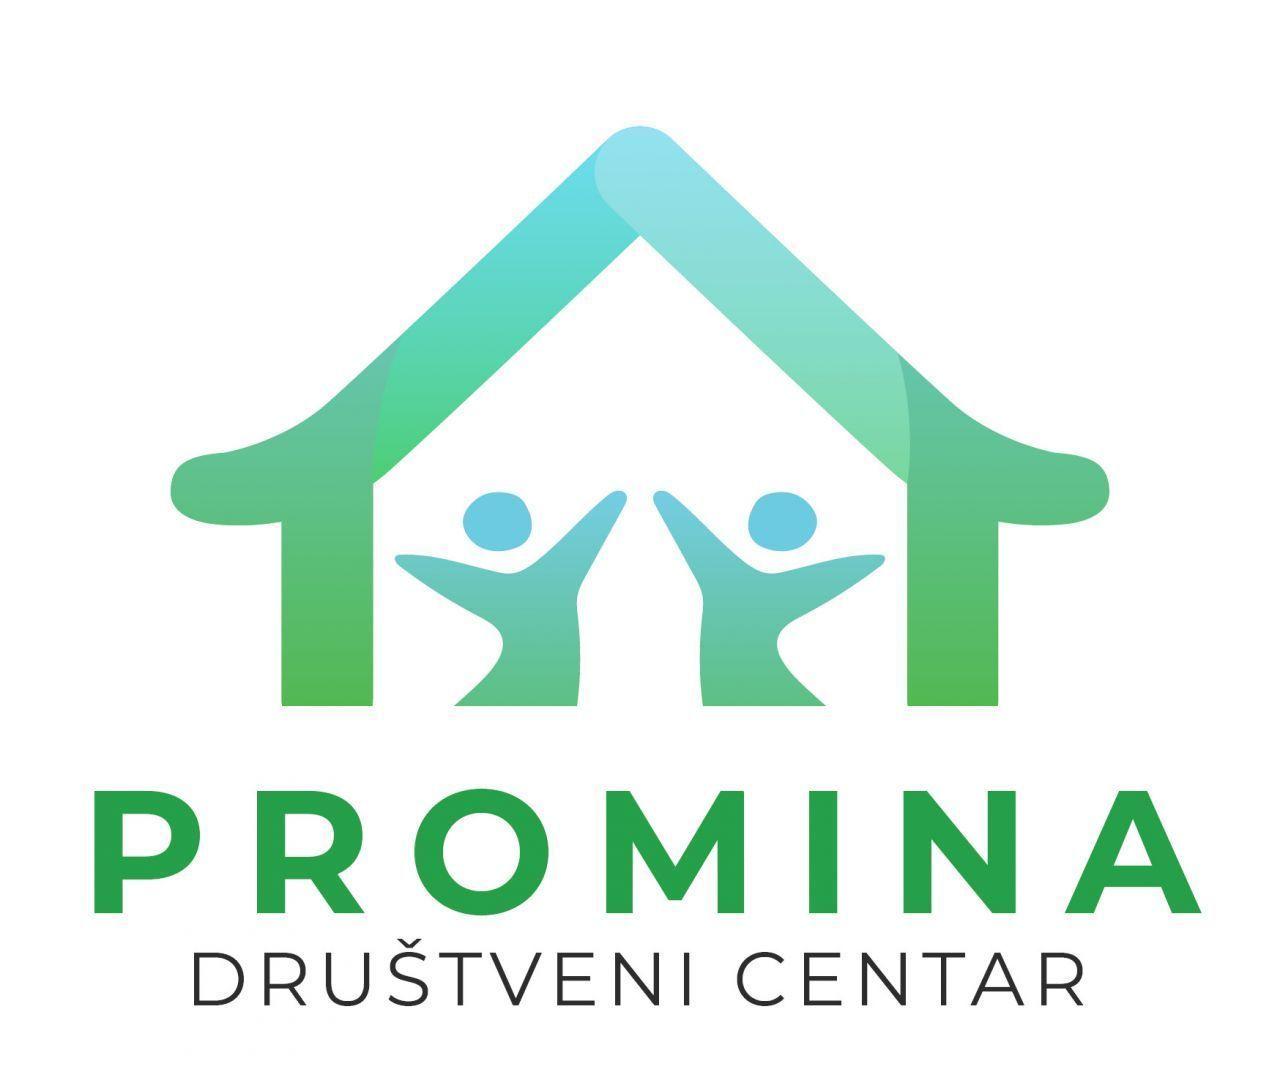 Društveni centar Promina - Kalendar događanja za 05/2021.